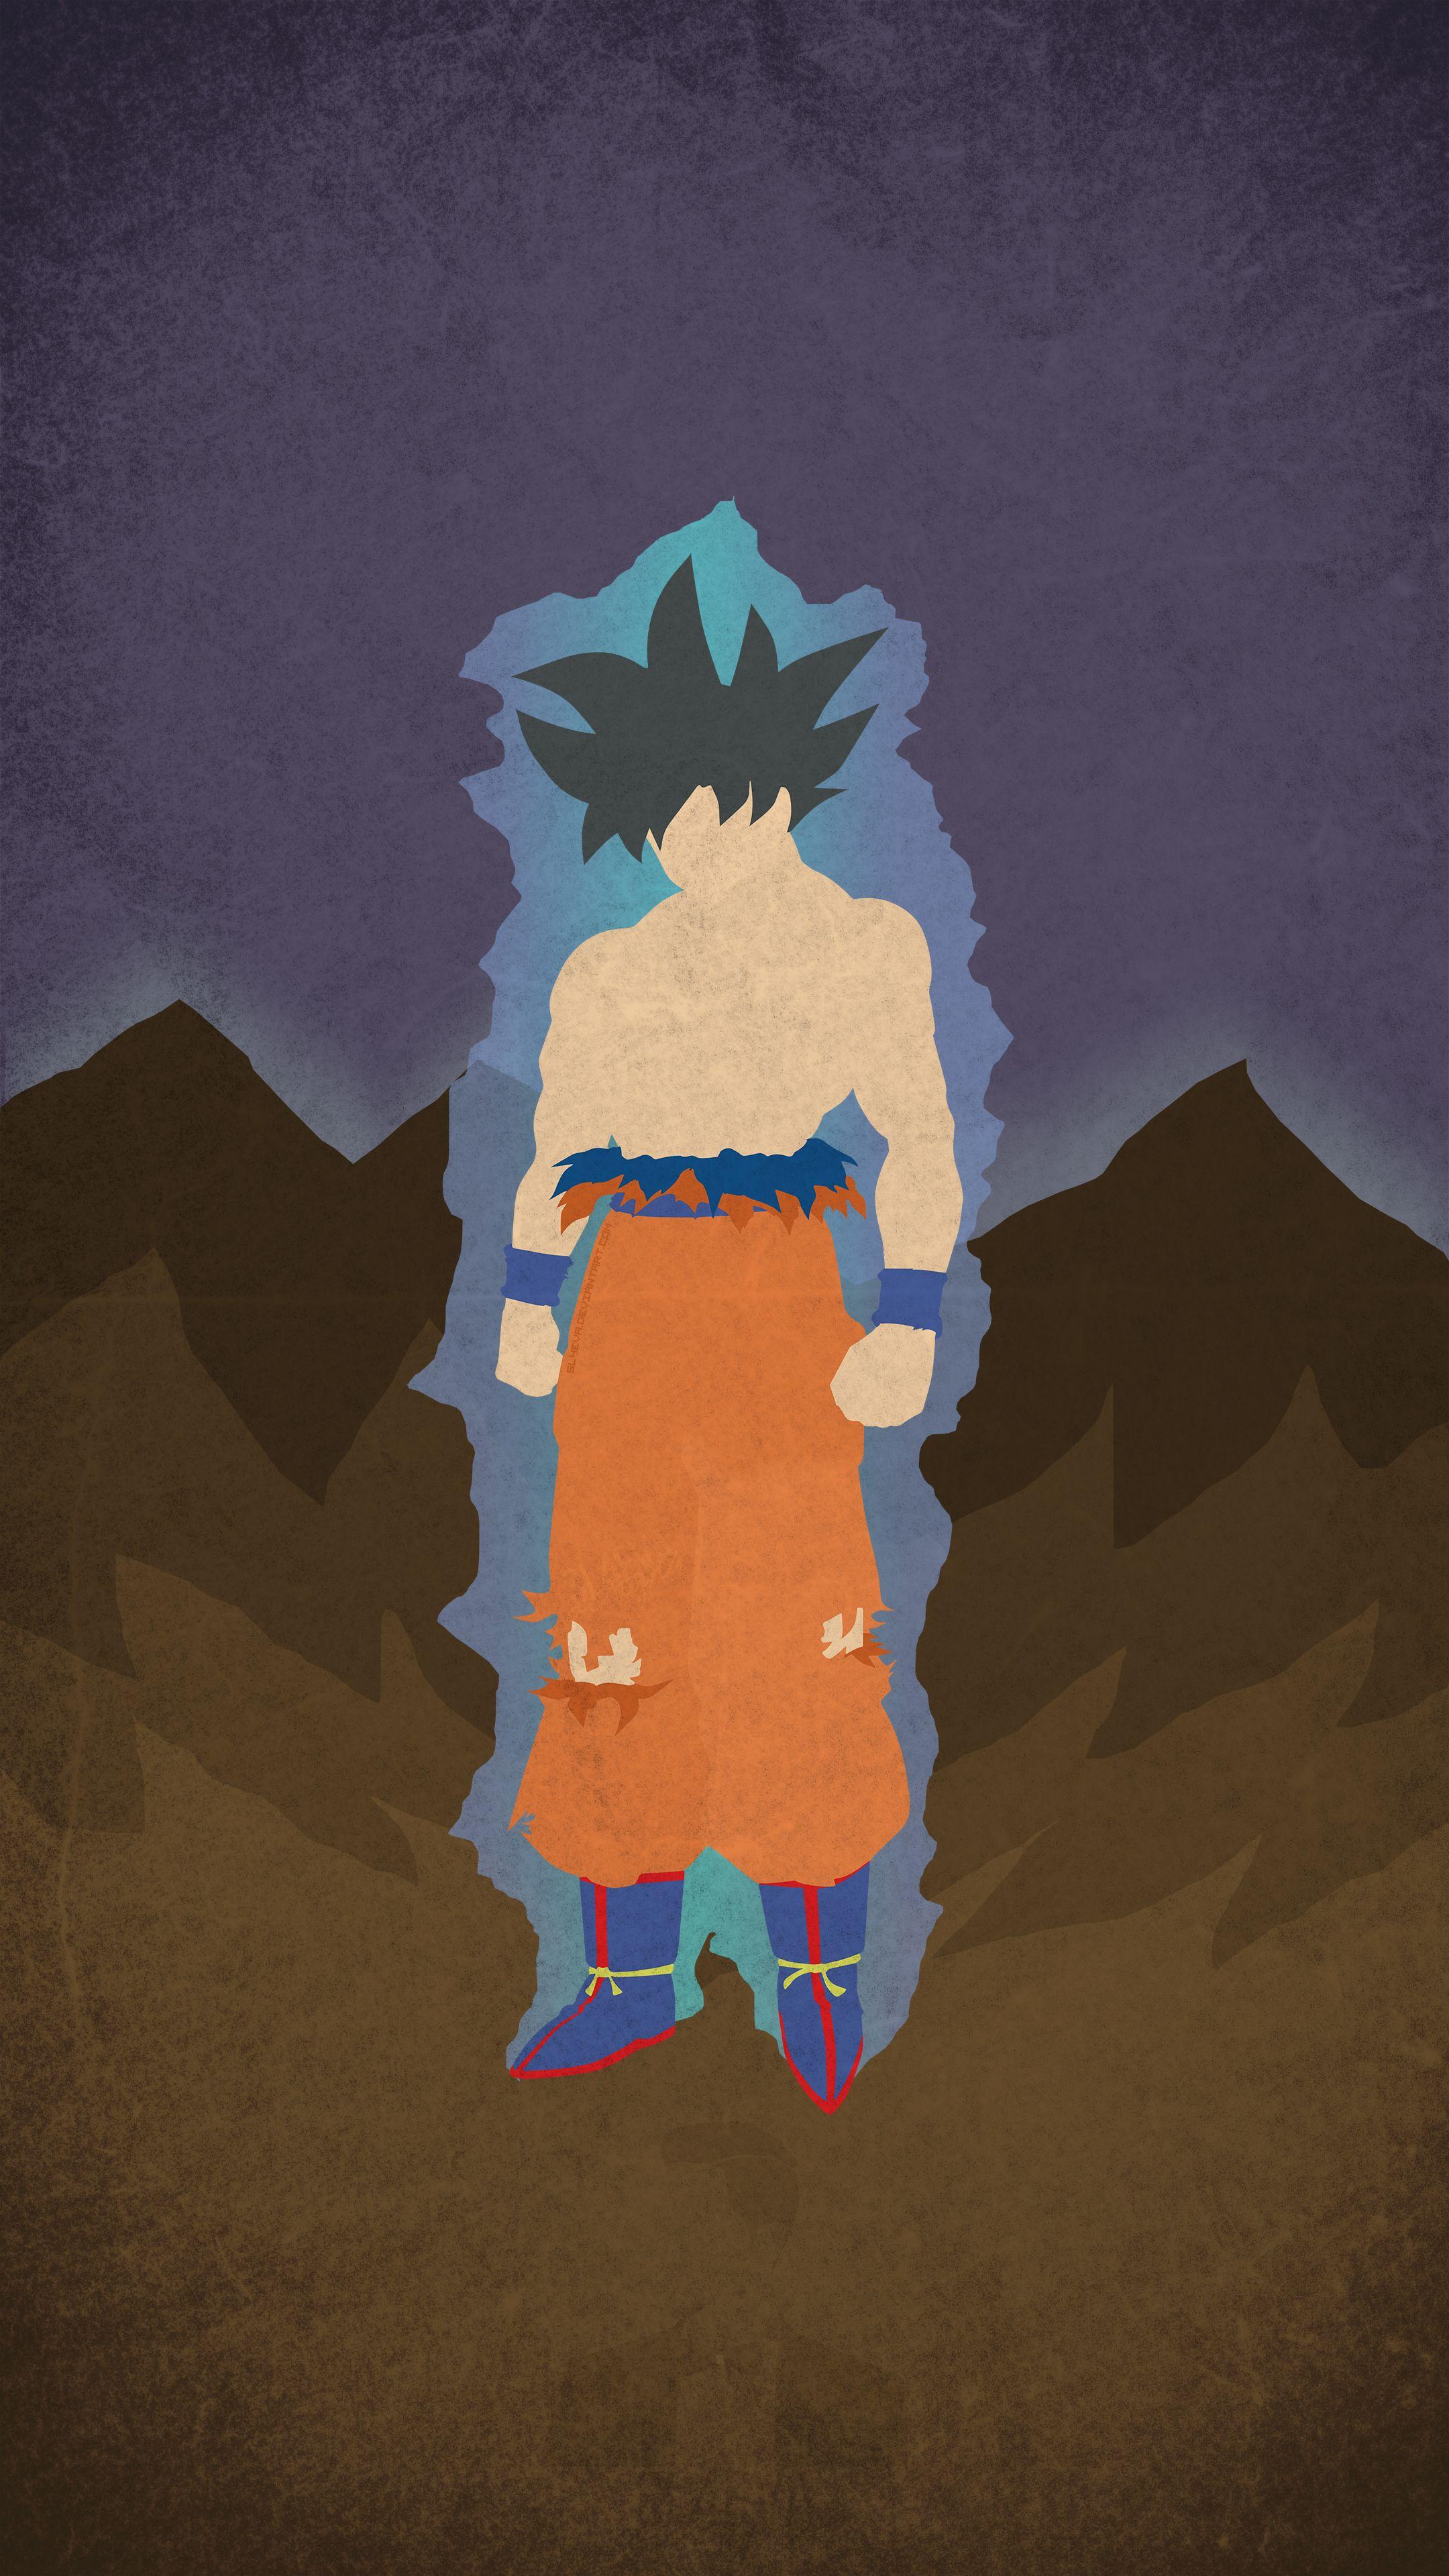 [OC] Ultra Instinct Goku Minimal Mobile Wallpaper dbz